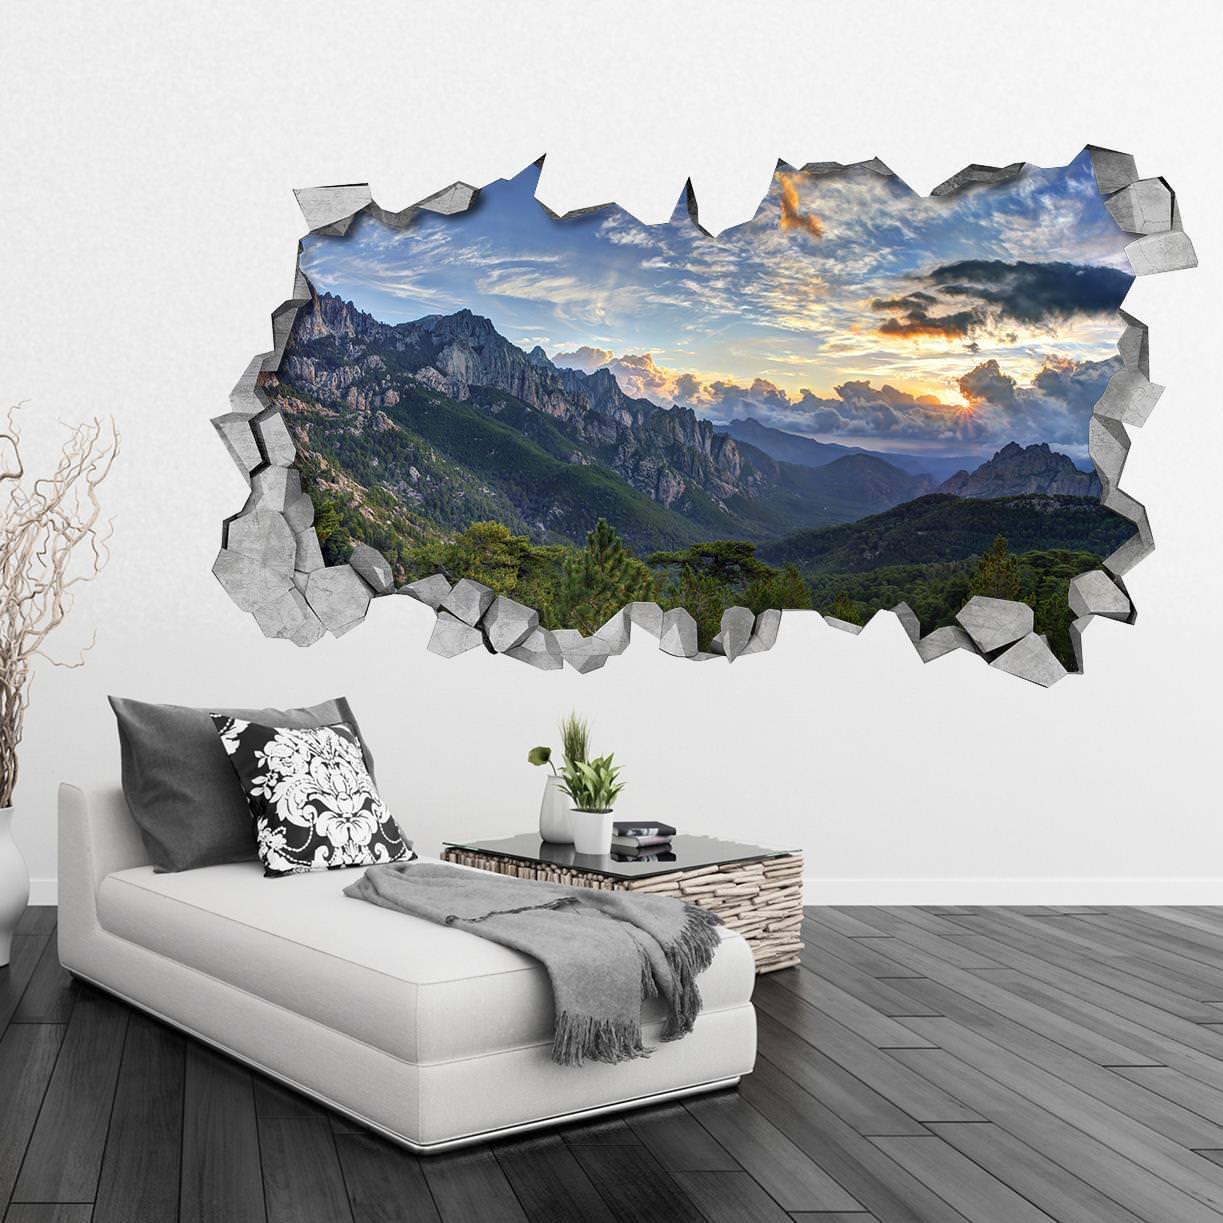 Vista para as montanhas paredes 3d - 3d vinyl wandtattoo ...